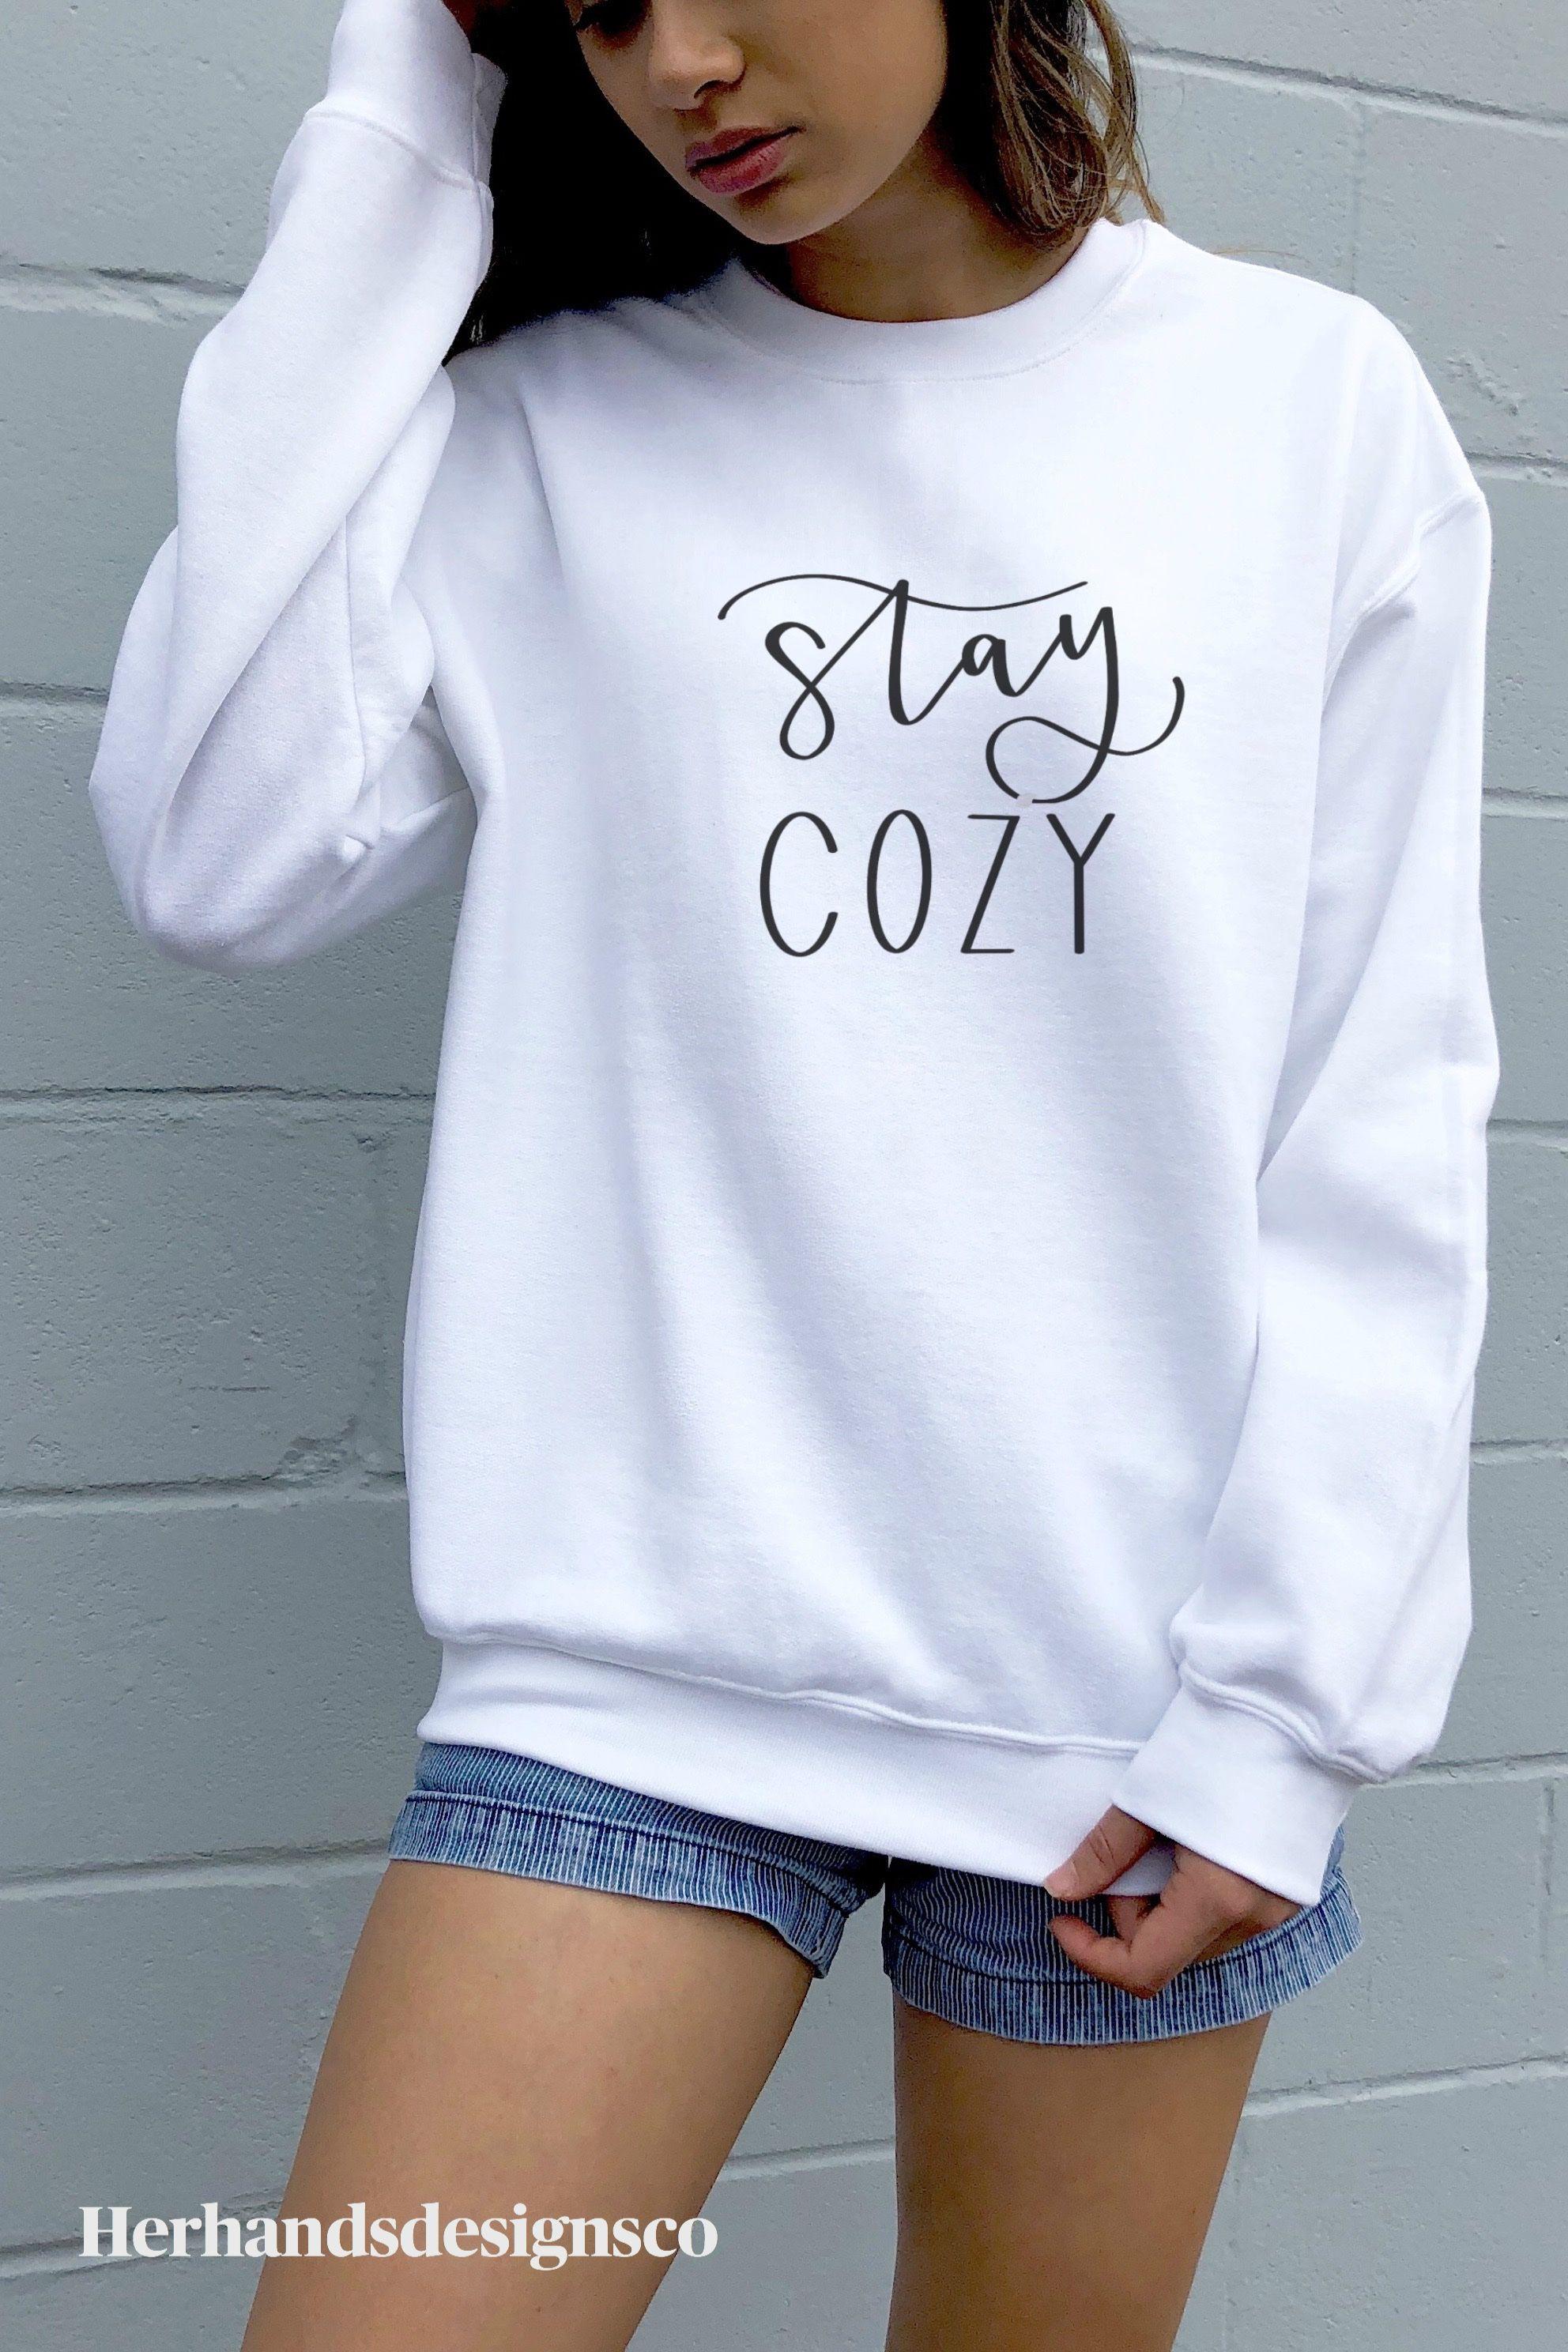 Stay Cozy Gildan Heavy Blend Crewneck Sweatshirt Etsy Casual Outfit Inspiration Sweatshirts Cozy Sweatshirts [ 2976 x 1984 Pixel ]